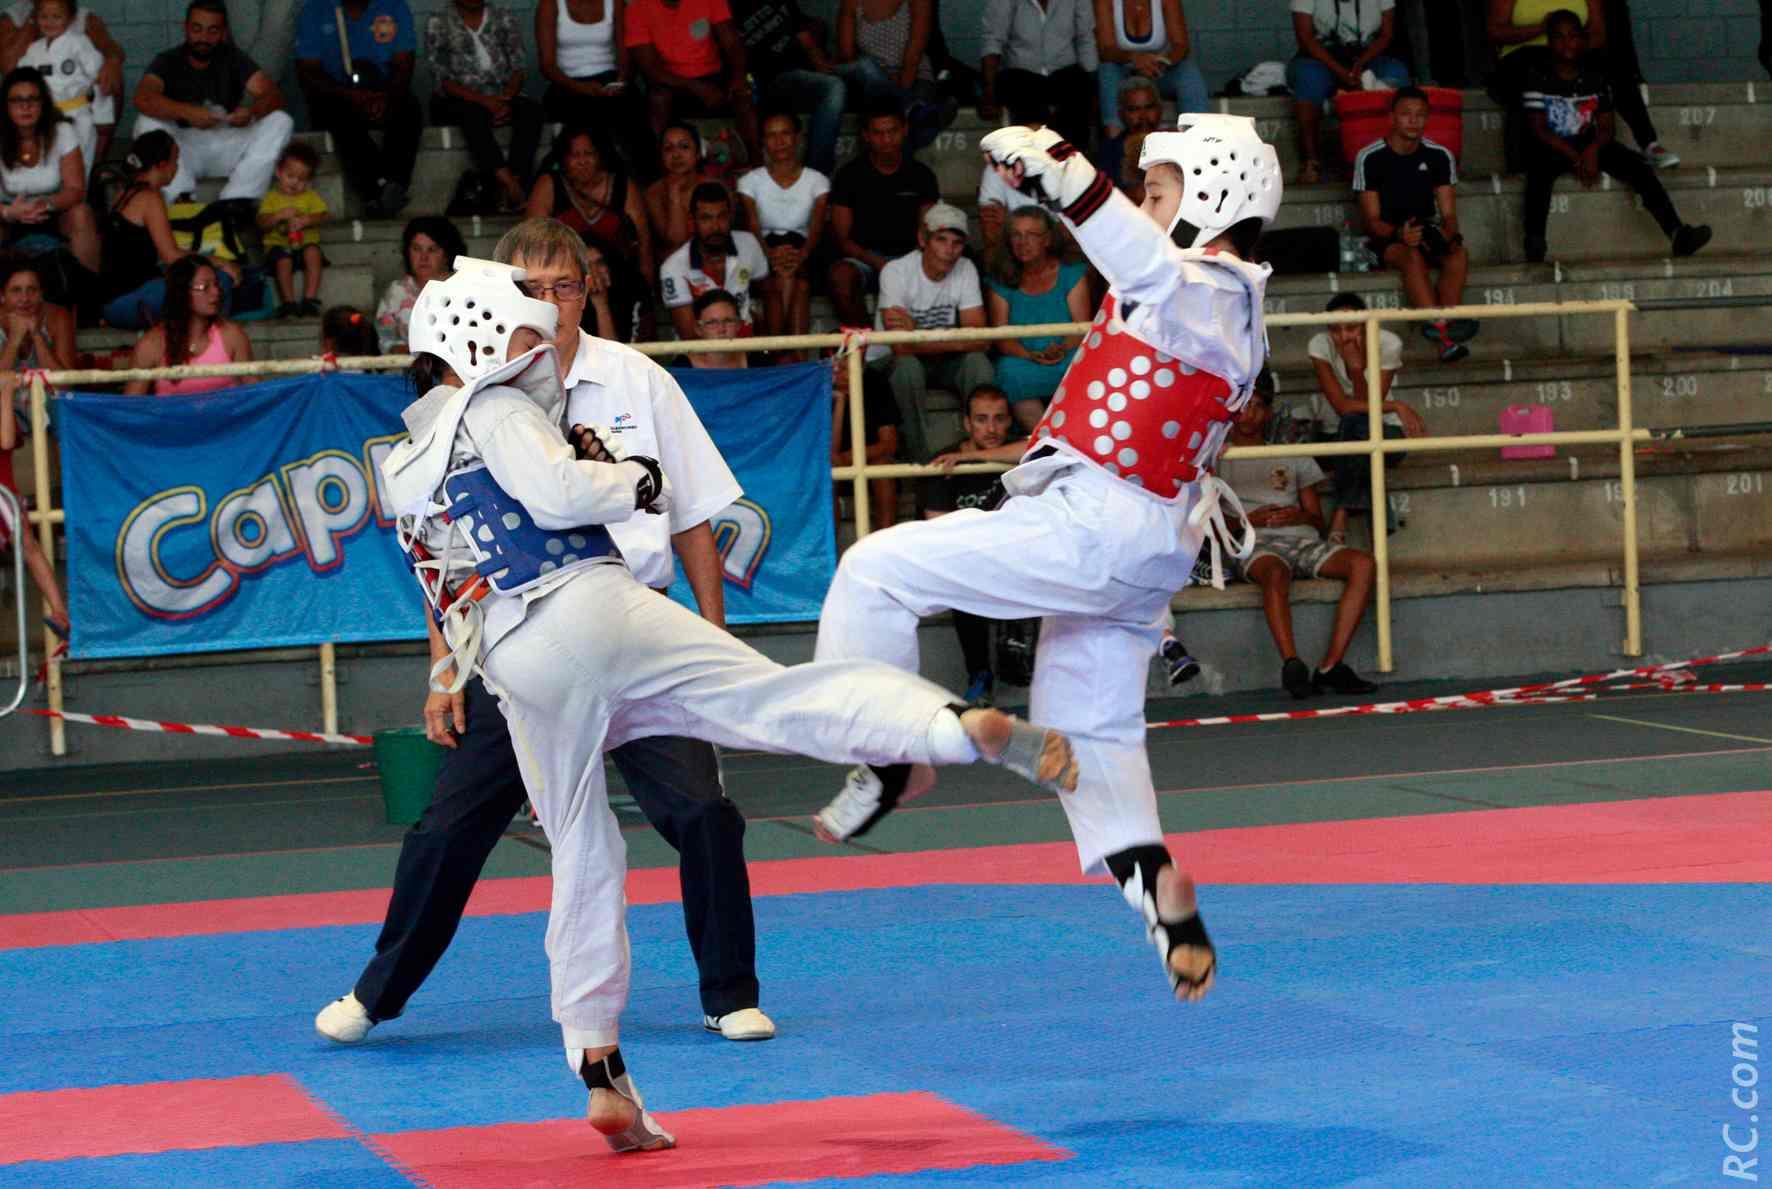 Taekwondo : Superbe ambiance à la Coupe Féminine 2017